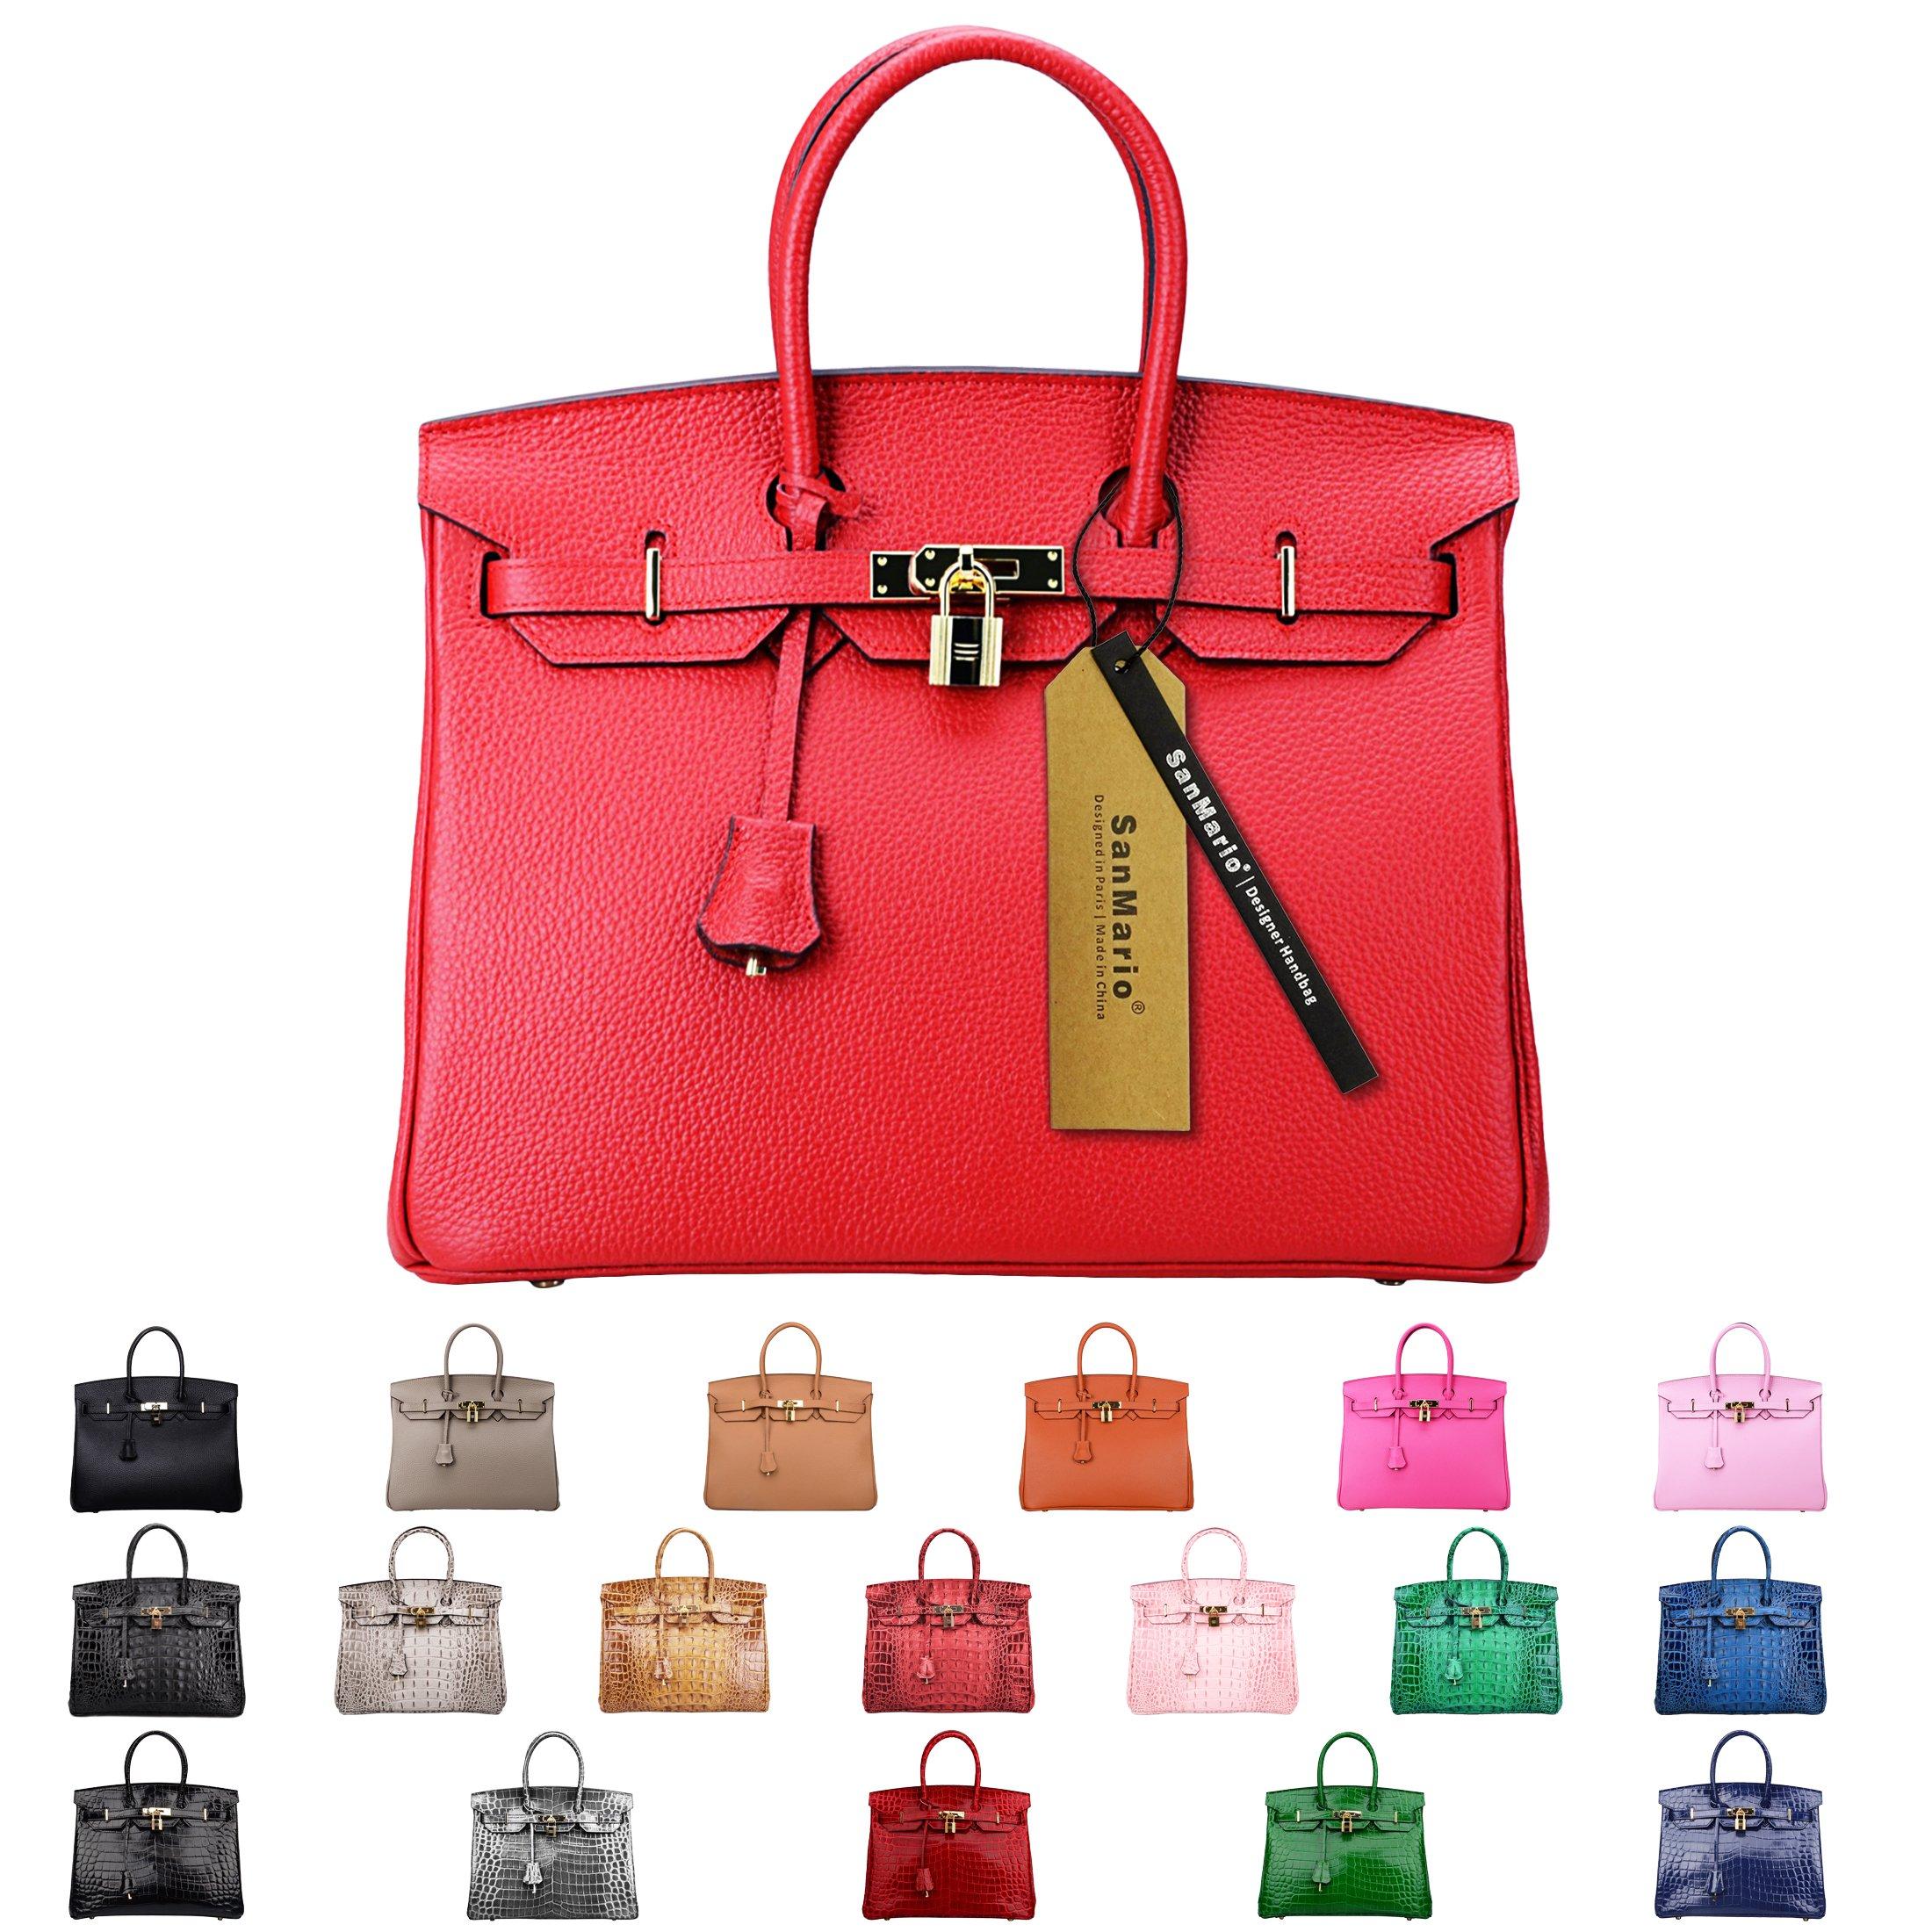 SanMario Designer Handbag Top Handle Padlock Women's Leather Bag with Golden Hardware Red 35cm/14'' by SanMario (Image #1)